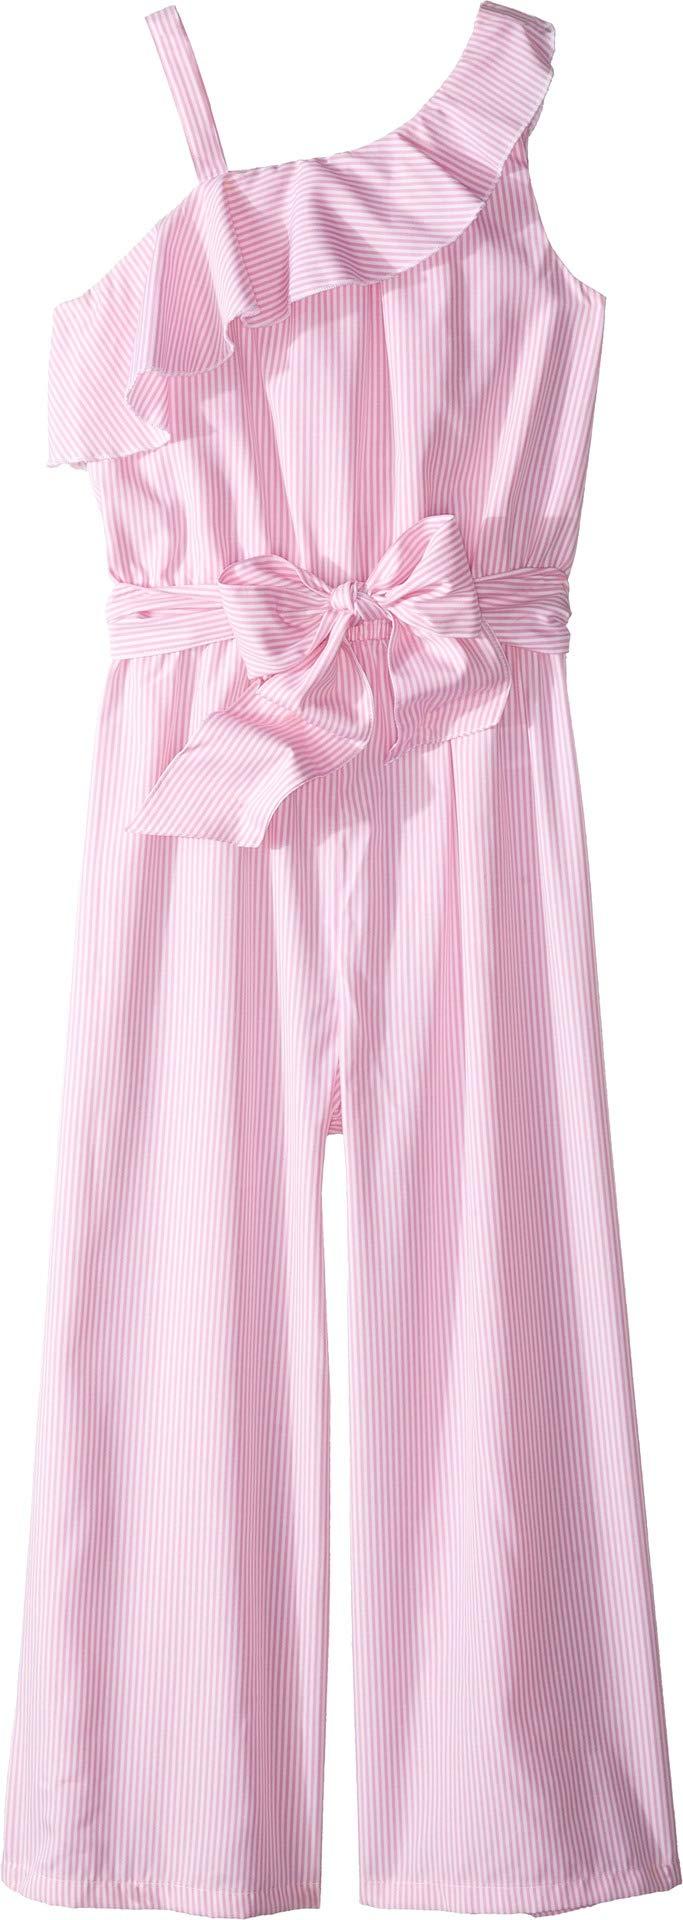 HABITUAL girl Girl's Thalia Jumpsuit with Tie (Big Kids) Light Pink 7-8